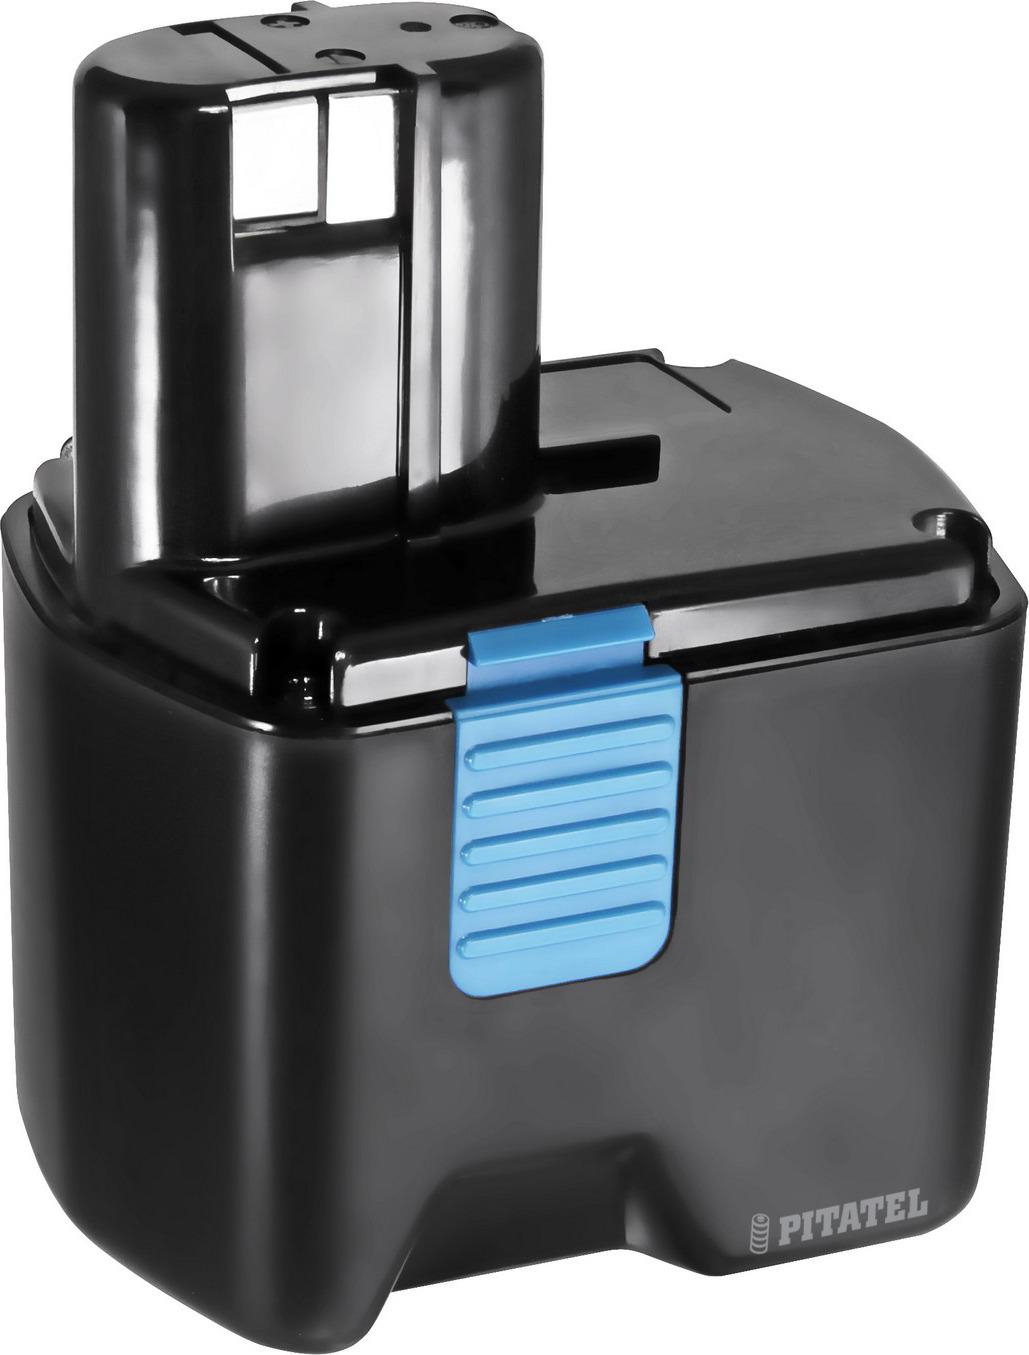 Аккумулятор для инструмента Pitatel для HITACHI. TSB-101-HIT18A-15C аккумулятор для телефона pitatel seb tp1003